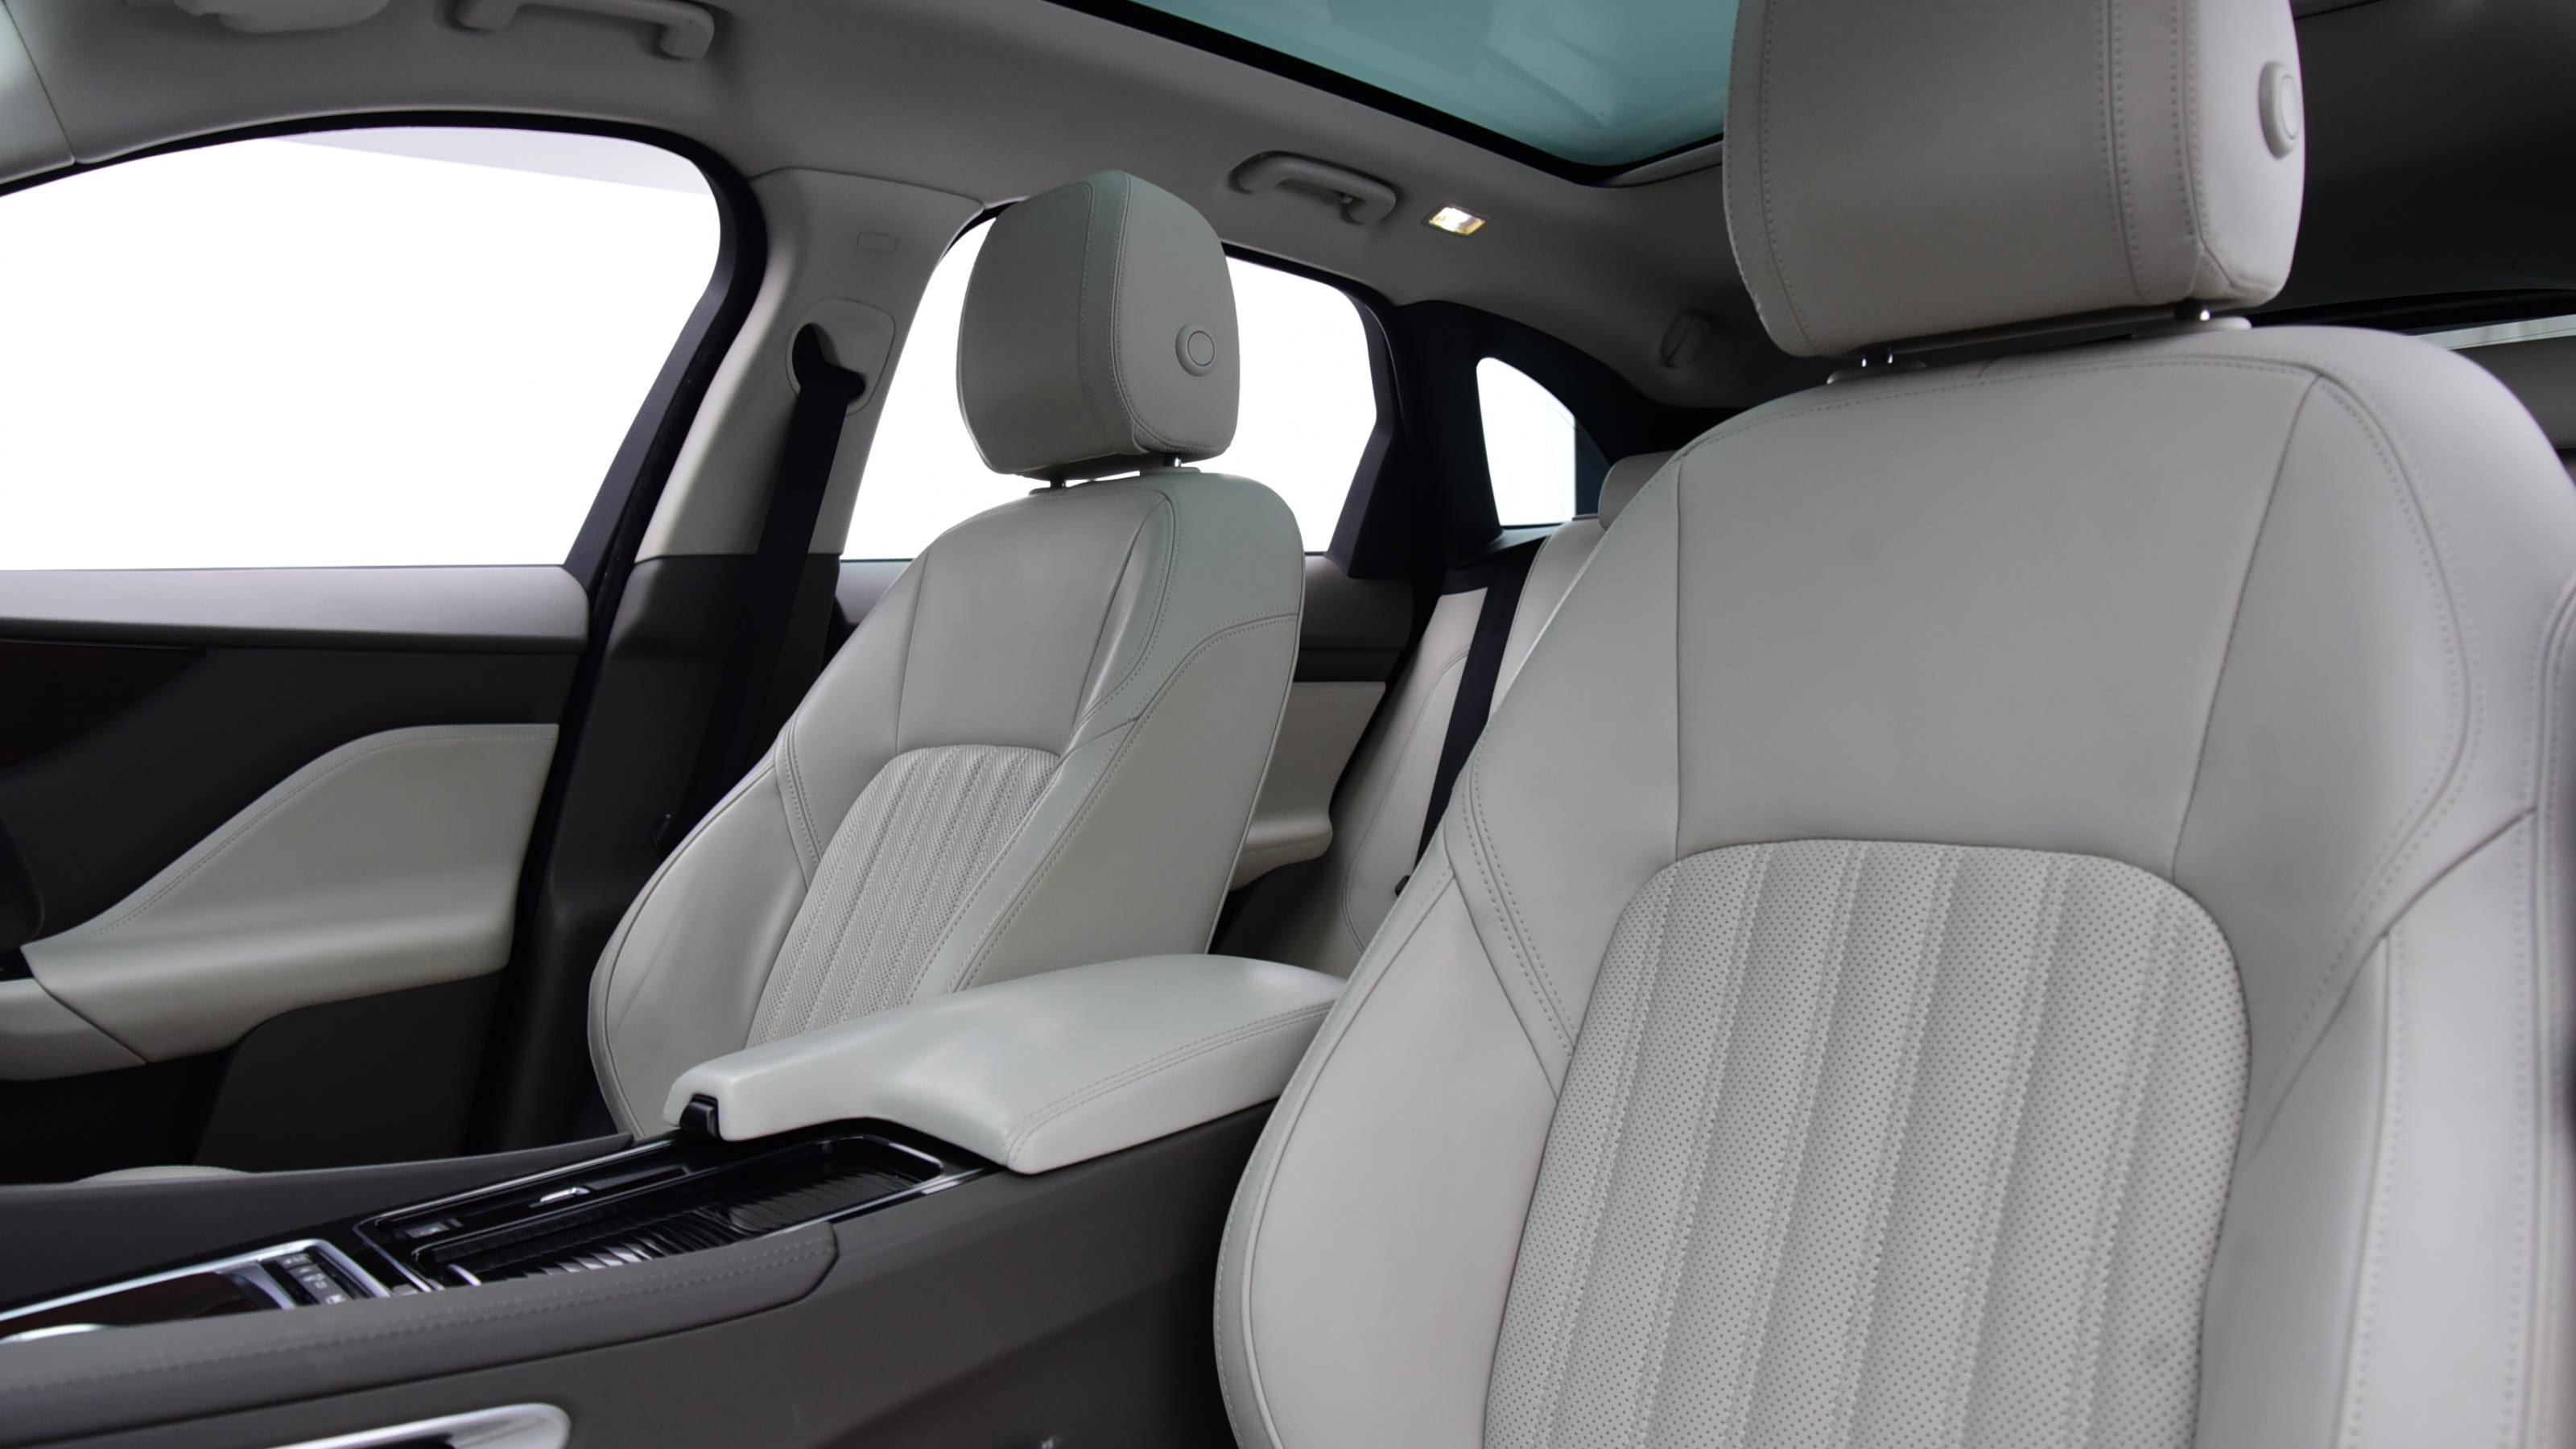 Used 2018 Jaguar F-PACE 2.0d Portfolio 5dr Auto AWD BLUE at Saxton4x4